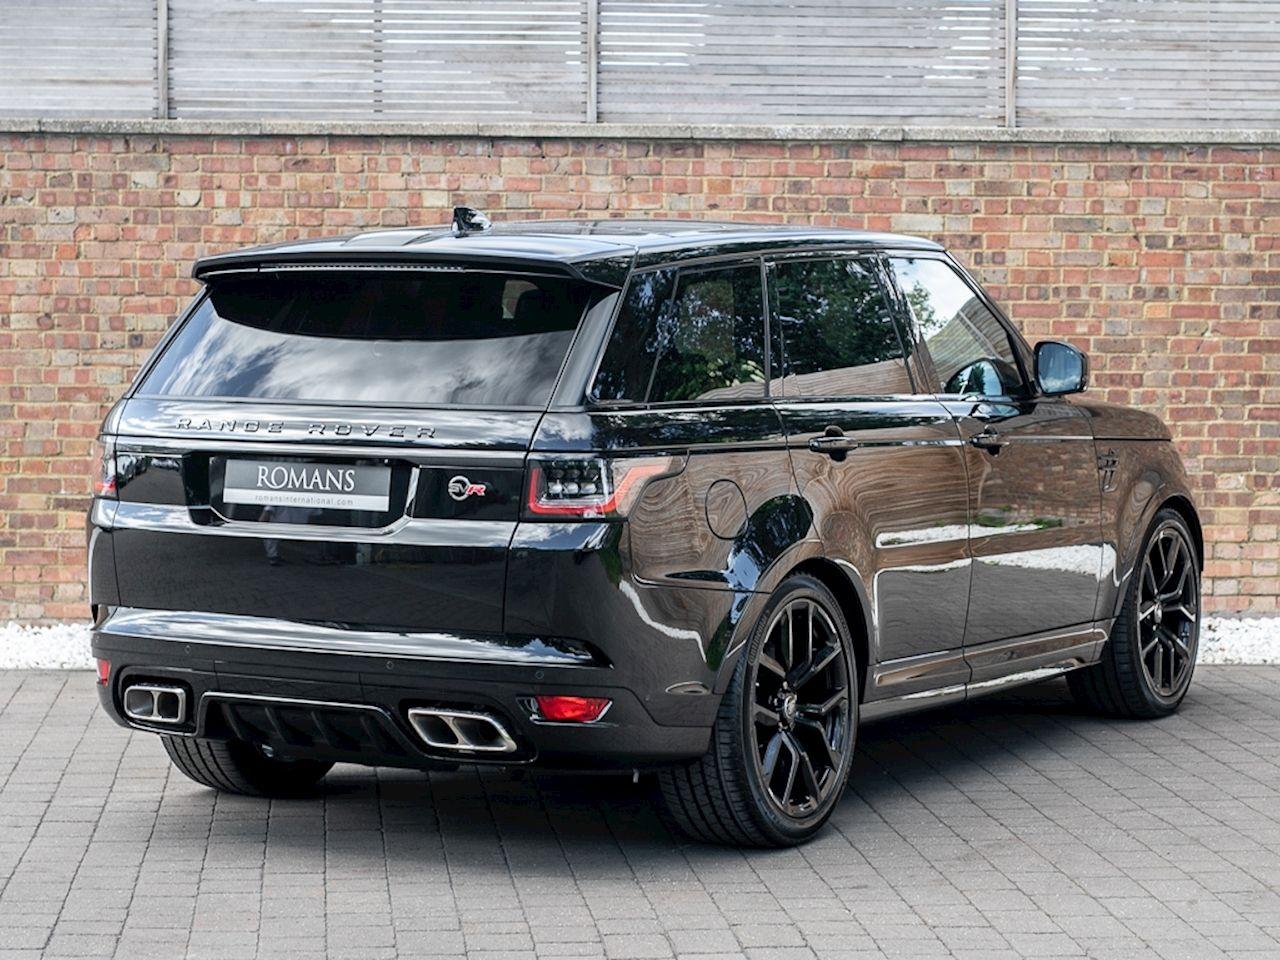 2018 Used Land Rover Range Rover Sport Svr Santorini Black Luxury Cars Range Rover Range Rover Sport Black Range Rover Black